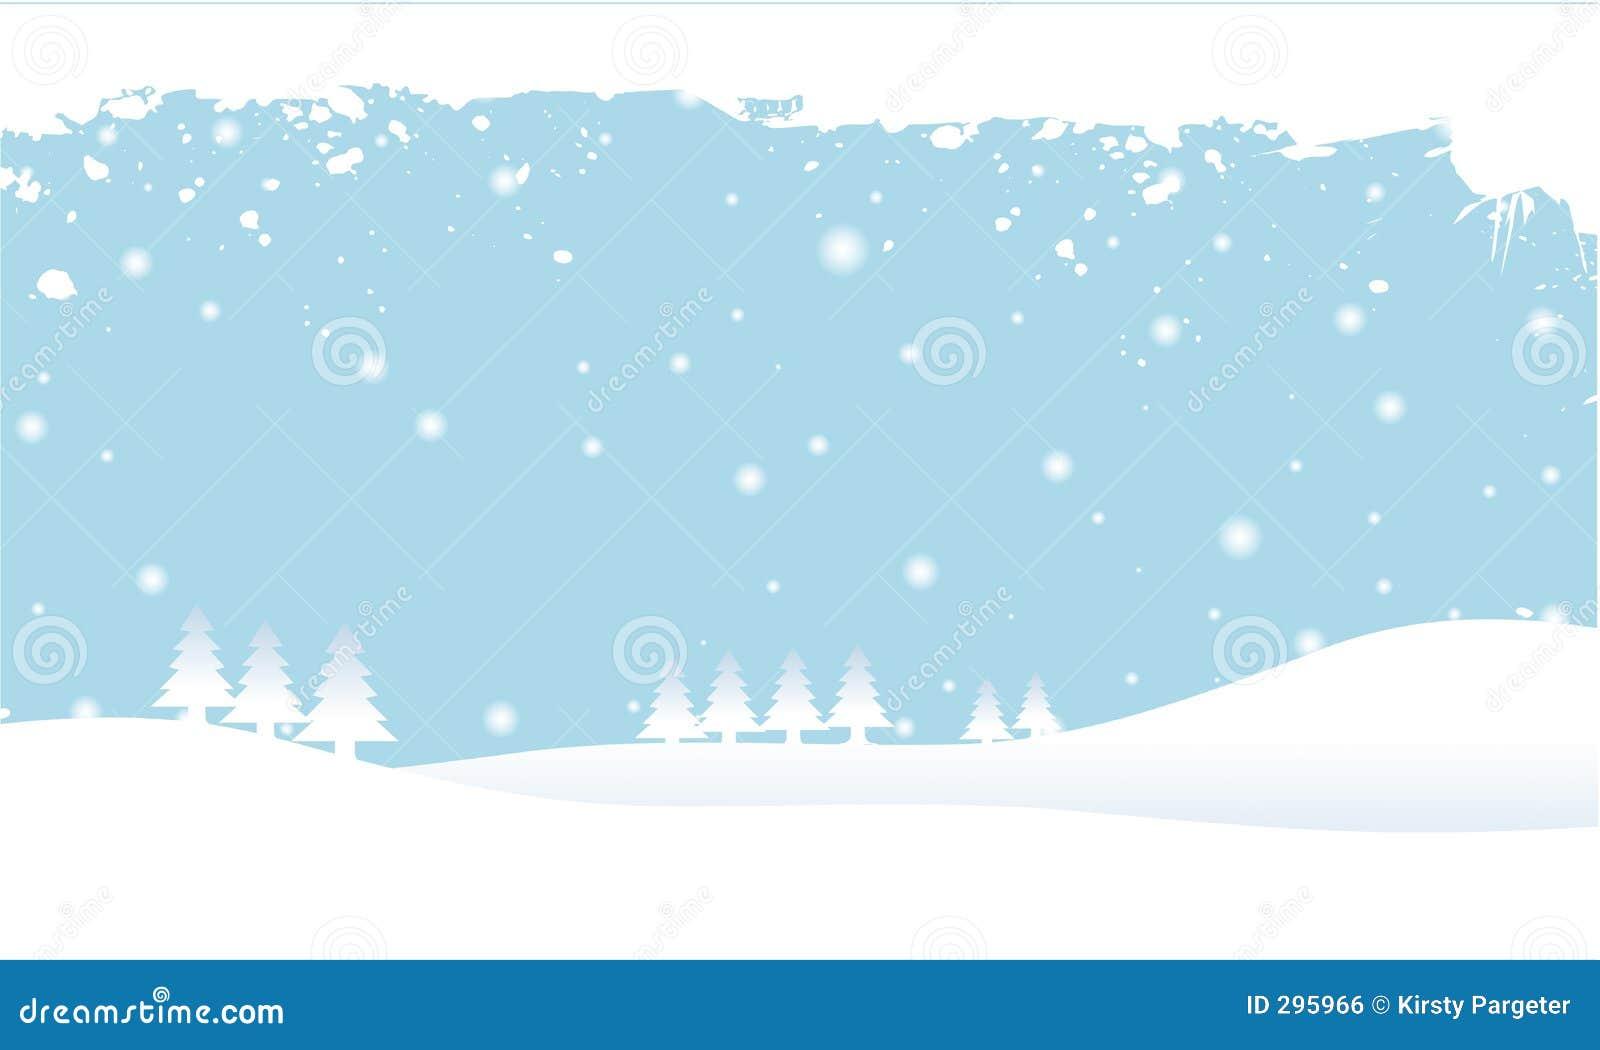 clipart snow scene - photo #34